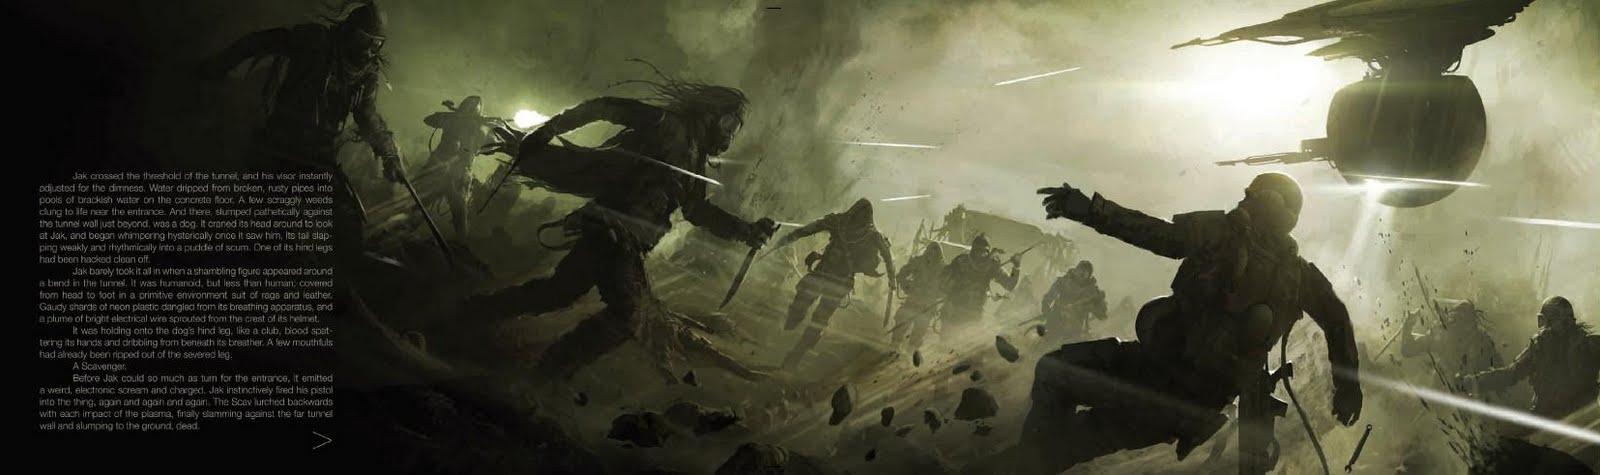 Oblivion Film Kino Trailer Page 2